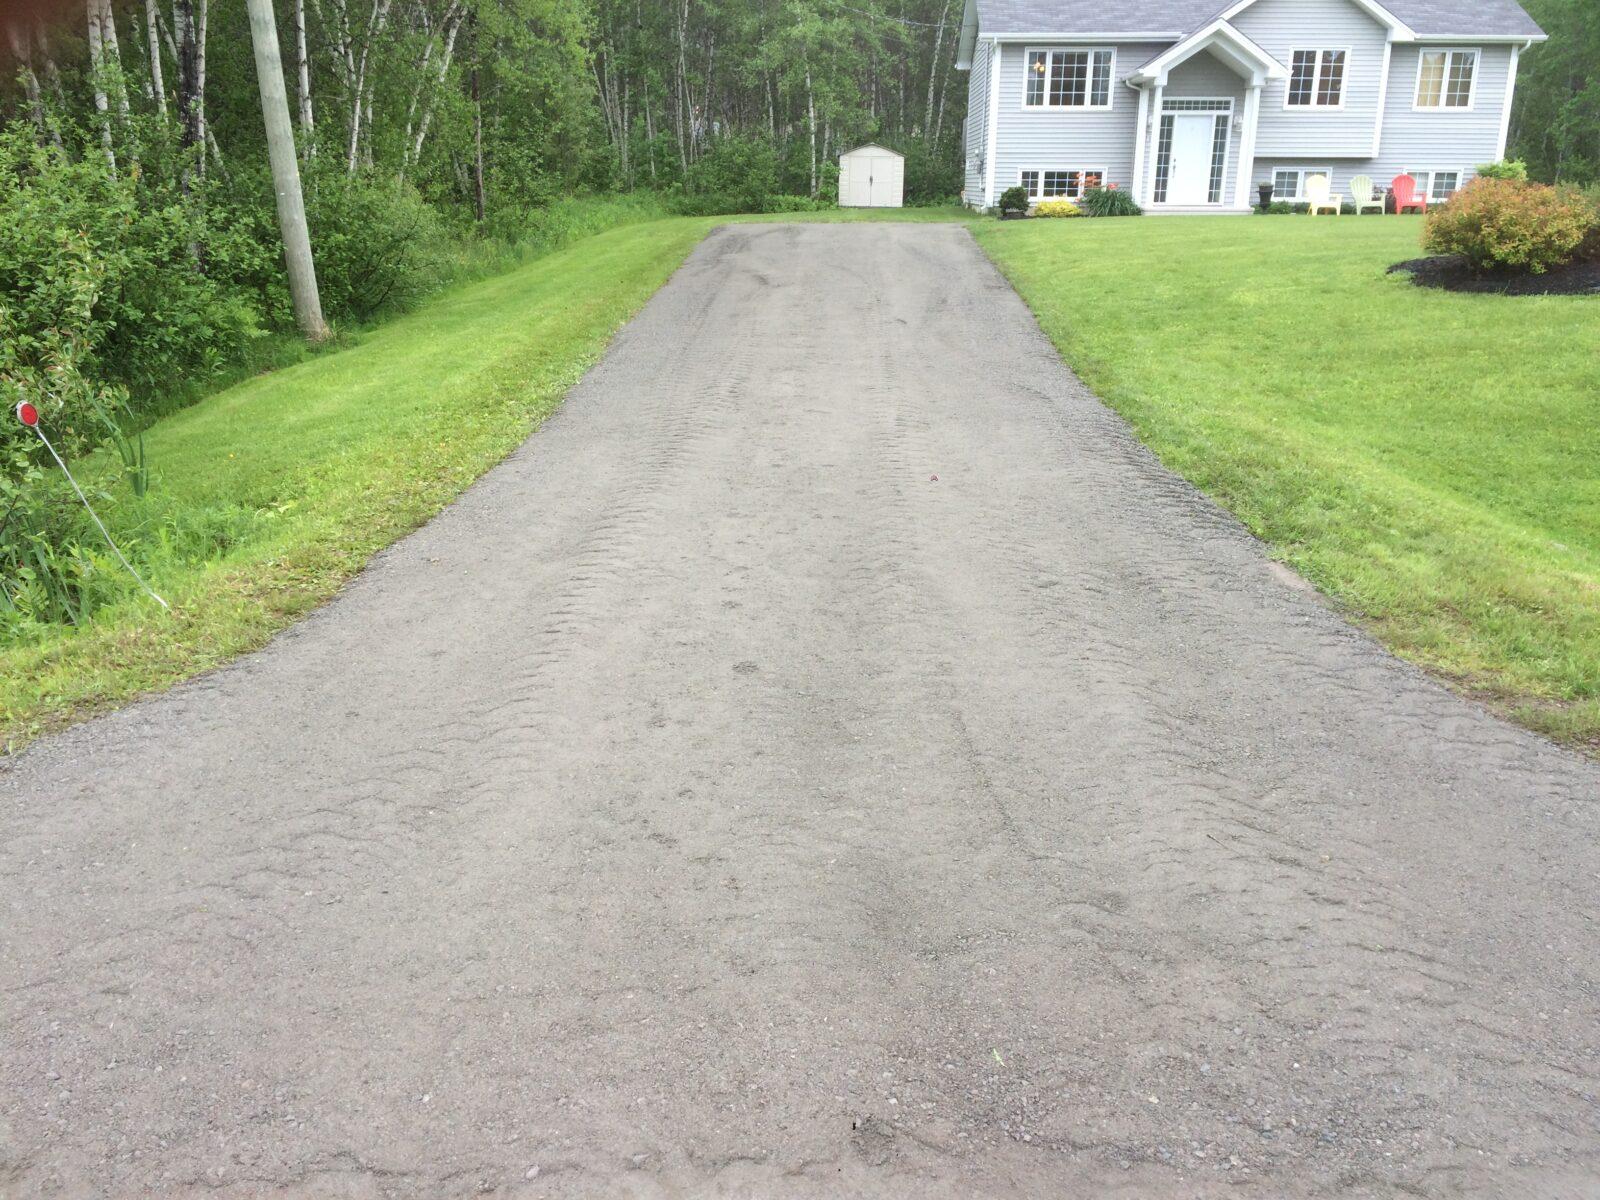 gravel doctor alrock estimate alrock ground maintenance moncton gravel driveway repair nb. Black Bedroom Furniture Sets. Home Design Ideas